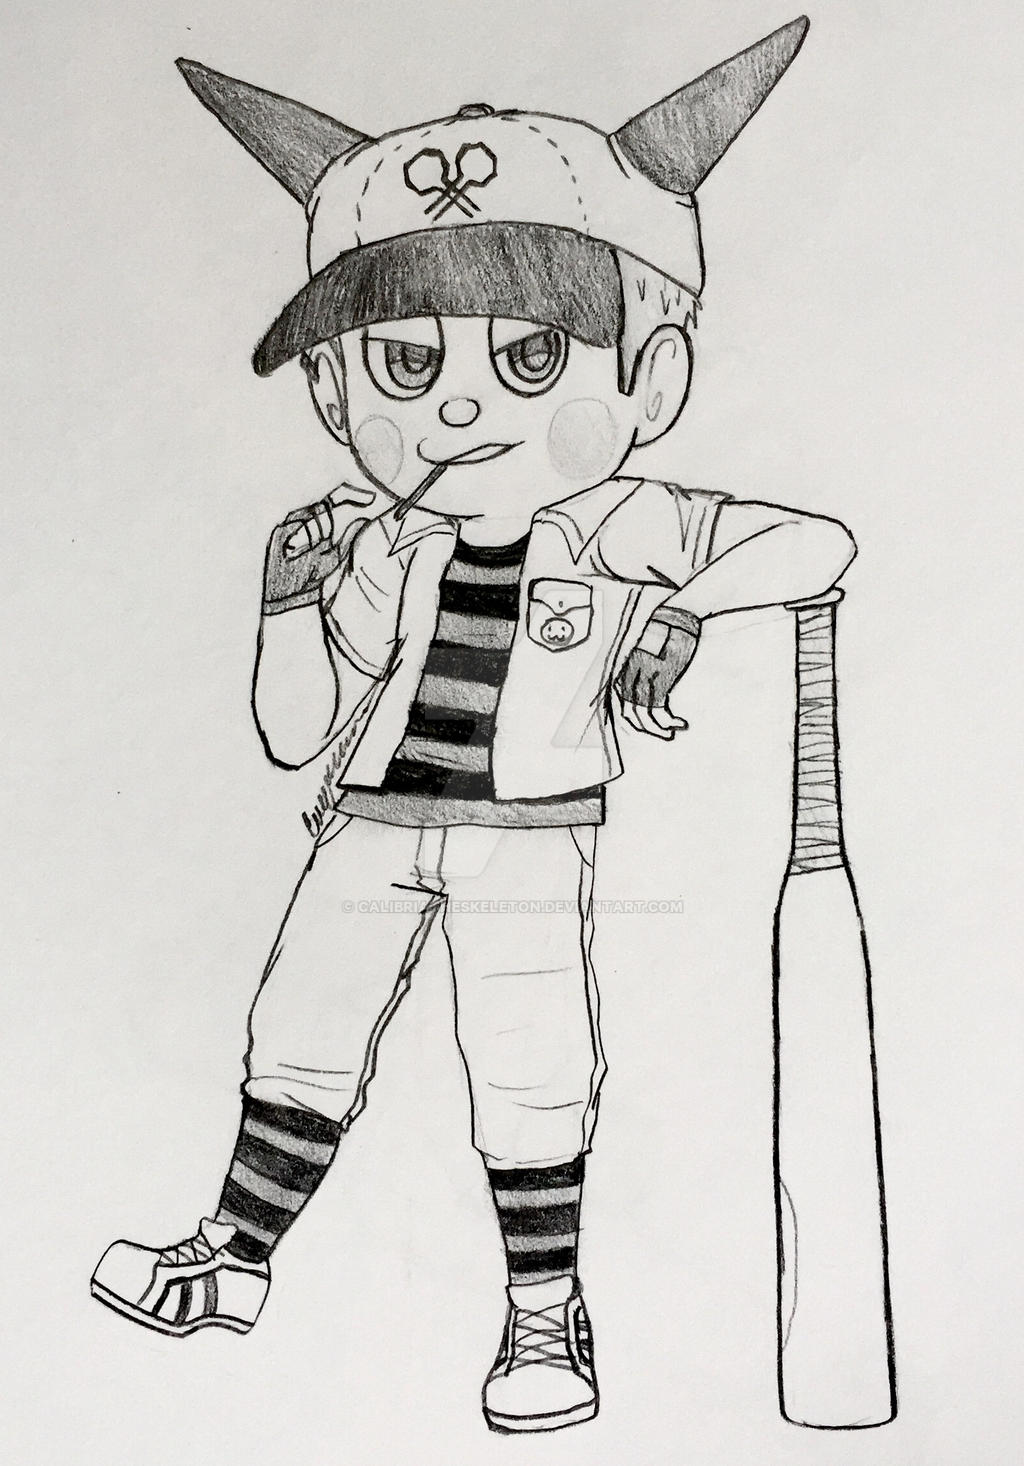 Ryoma Hoshi Shsl Baseball Star By Calibriatheskeleton On Deviantart 57,425 likes · 2,757 talking about this. ryoma hoshi shsl baseball star by